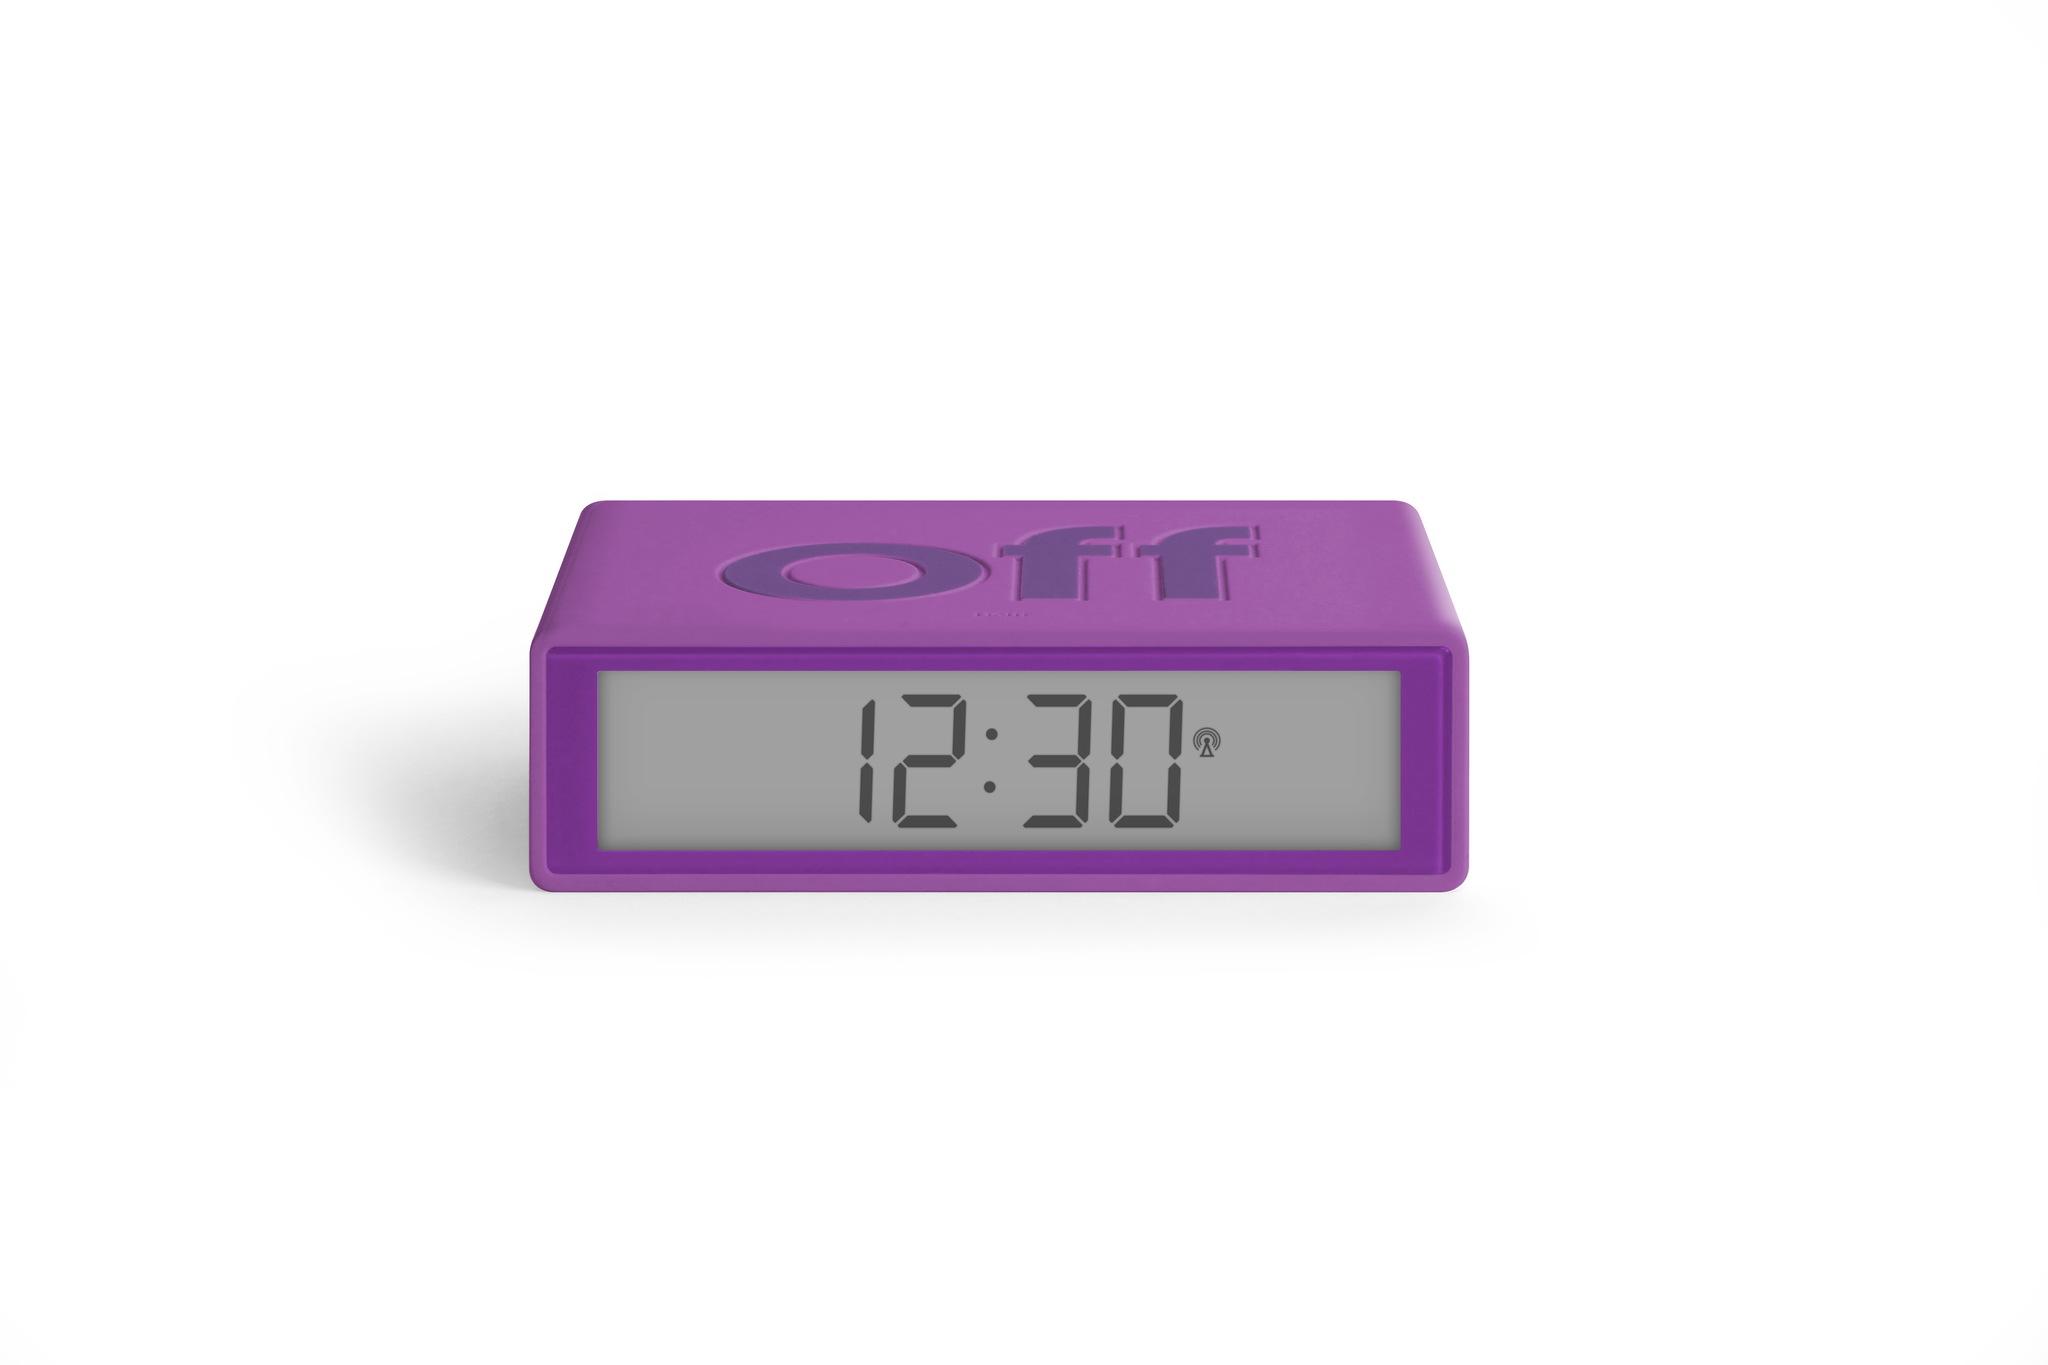 violett, funkgesteuert, LCD Display, snooze